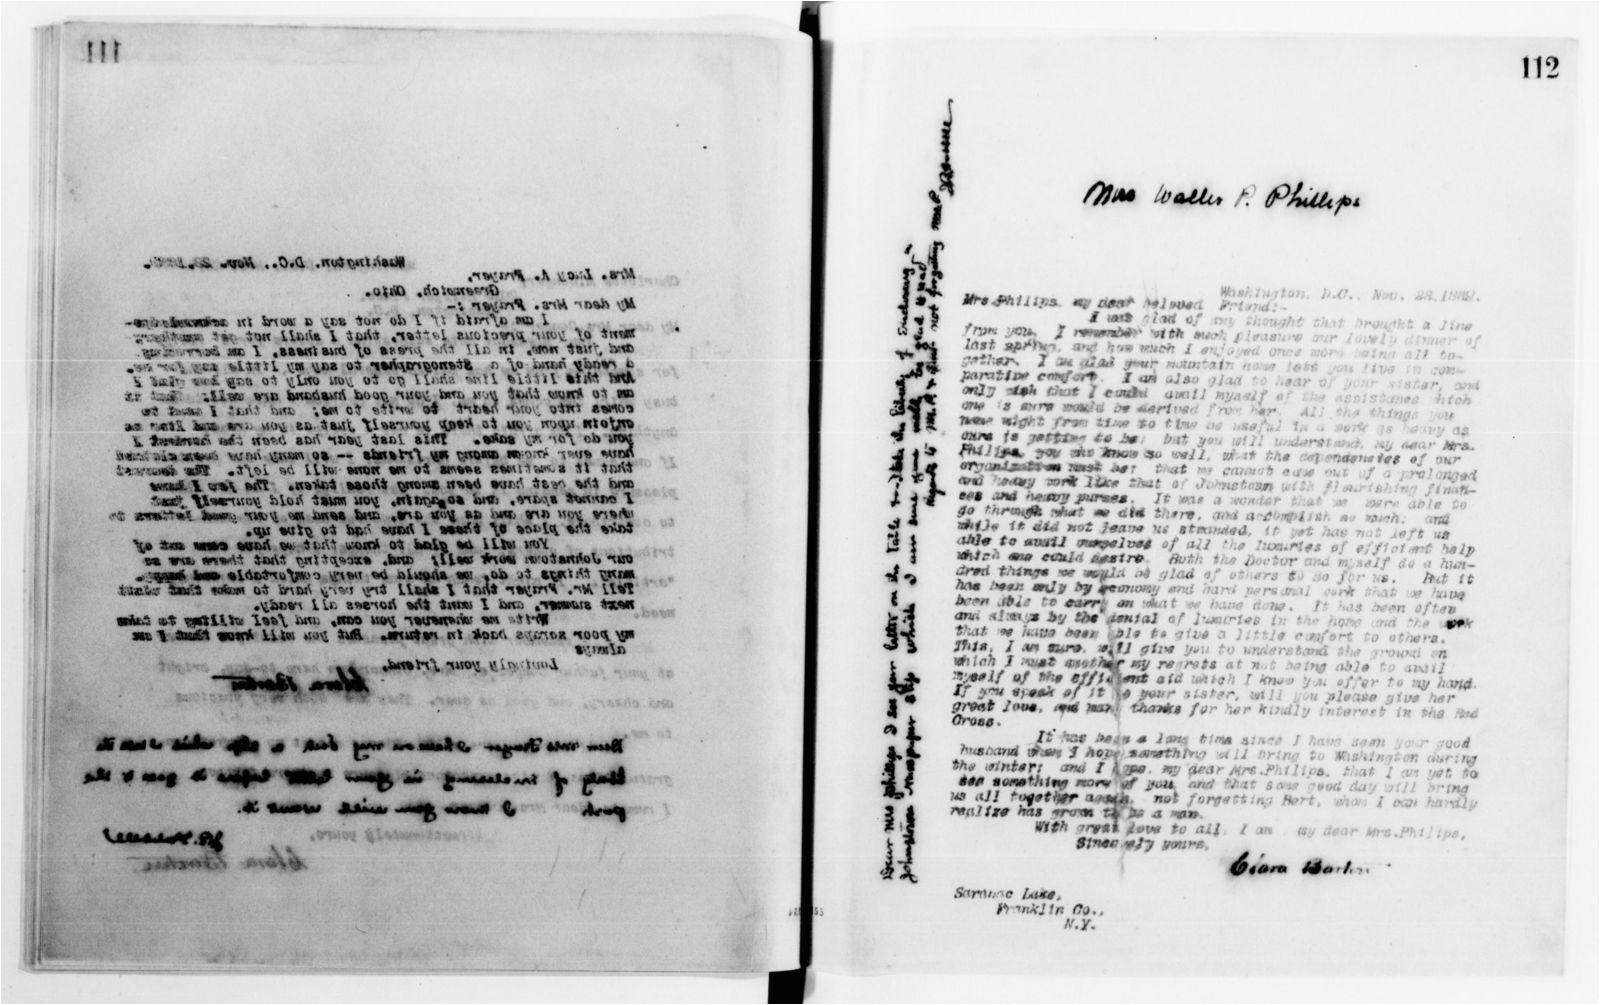 clara barton papers letterbooks 1876 1911 1889 apr 1891 dec pp 1 317 157 1600 jpg